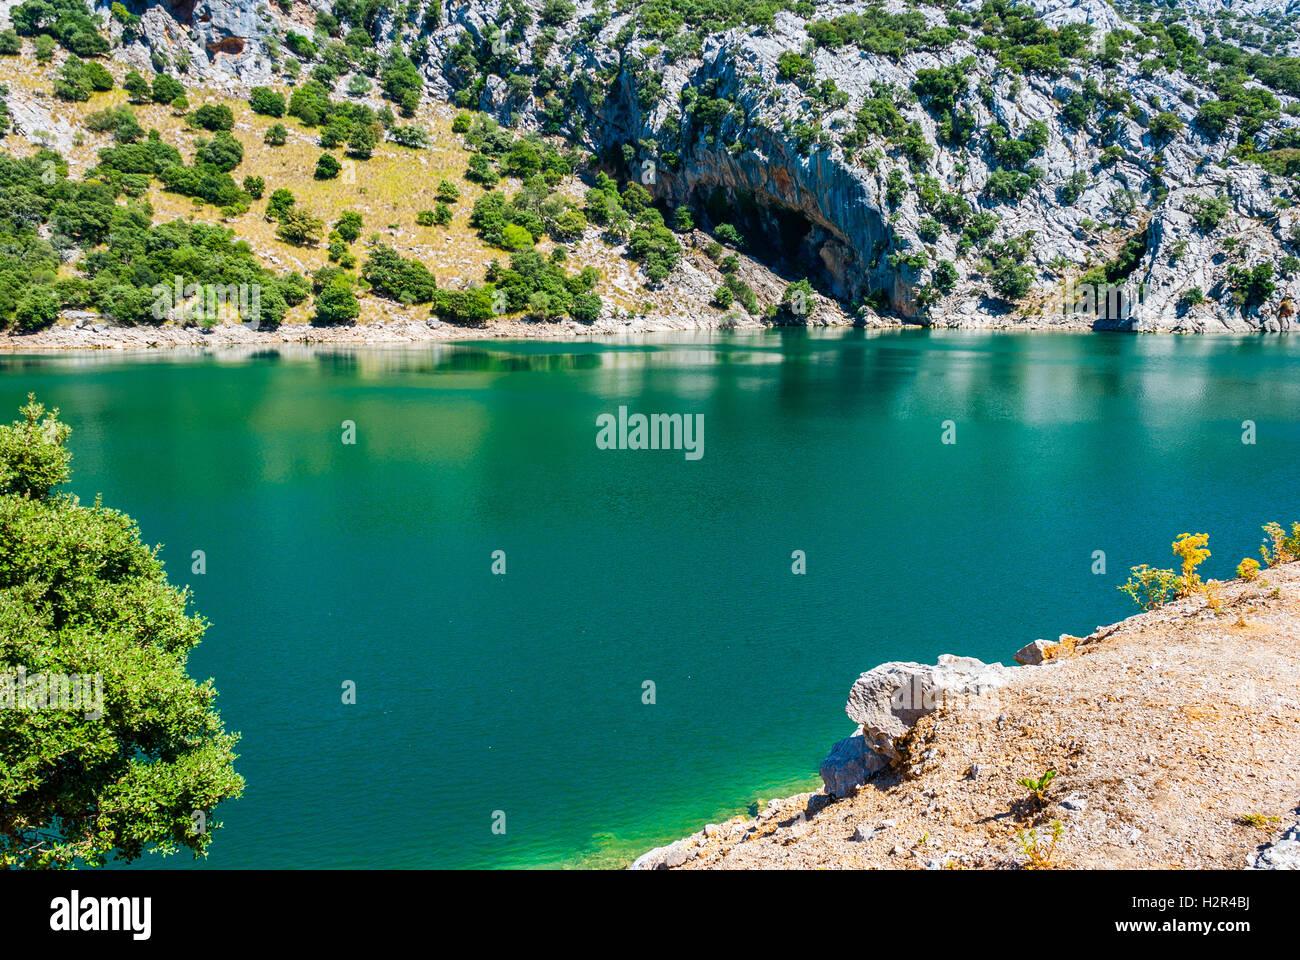 Gorg Blau, Majorca - Stock Image